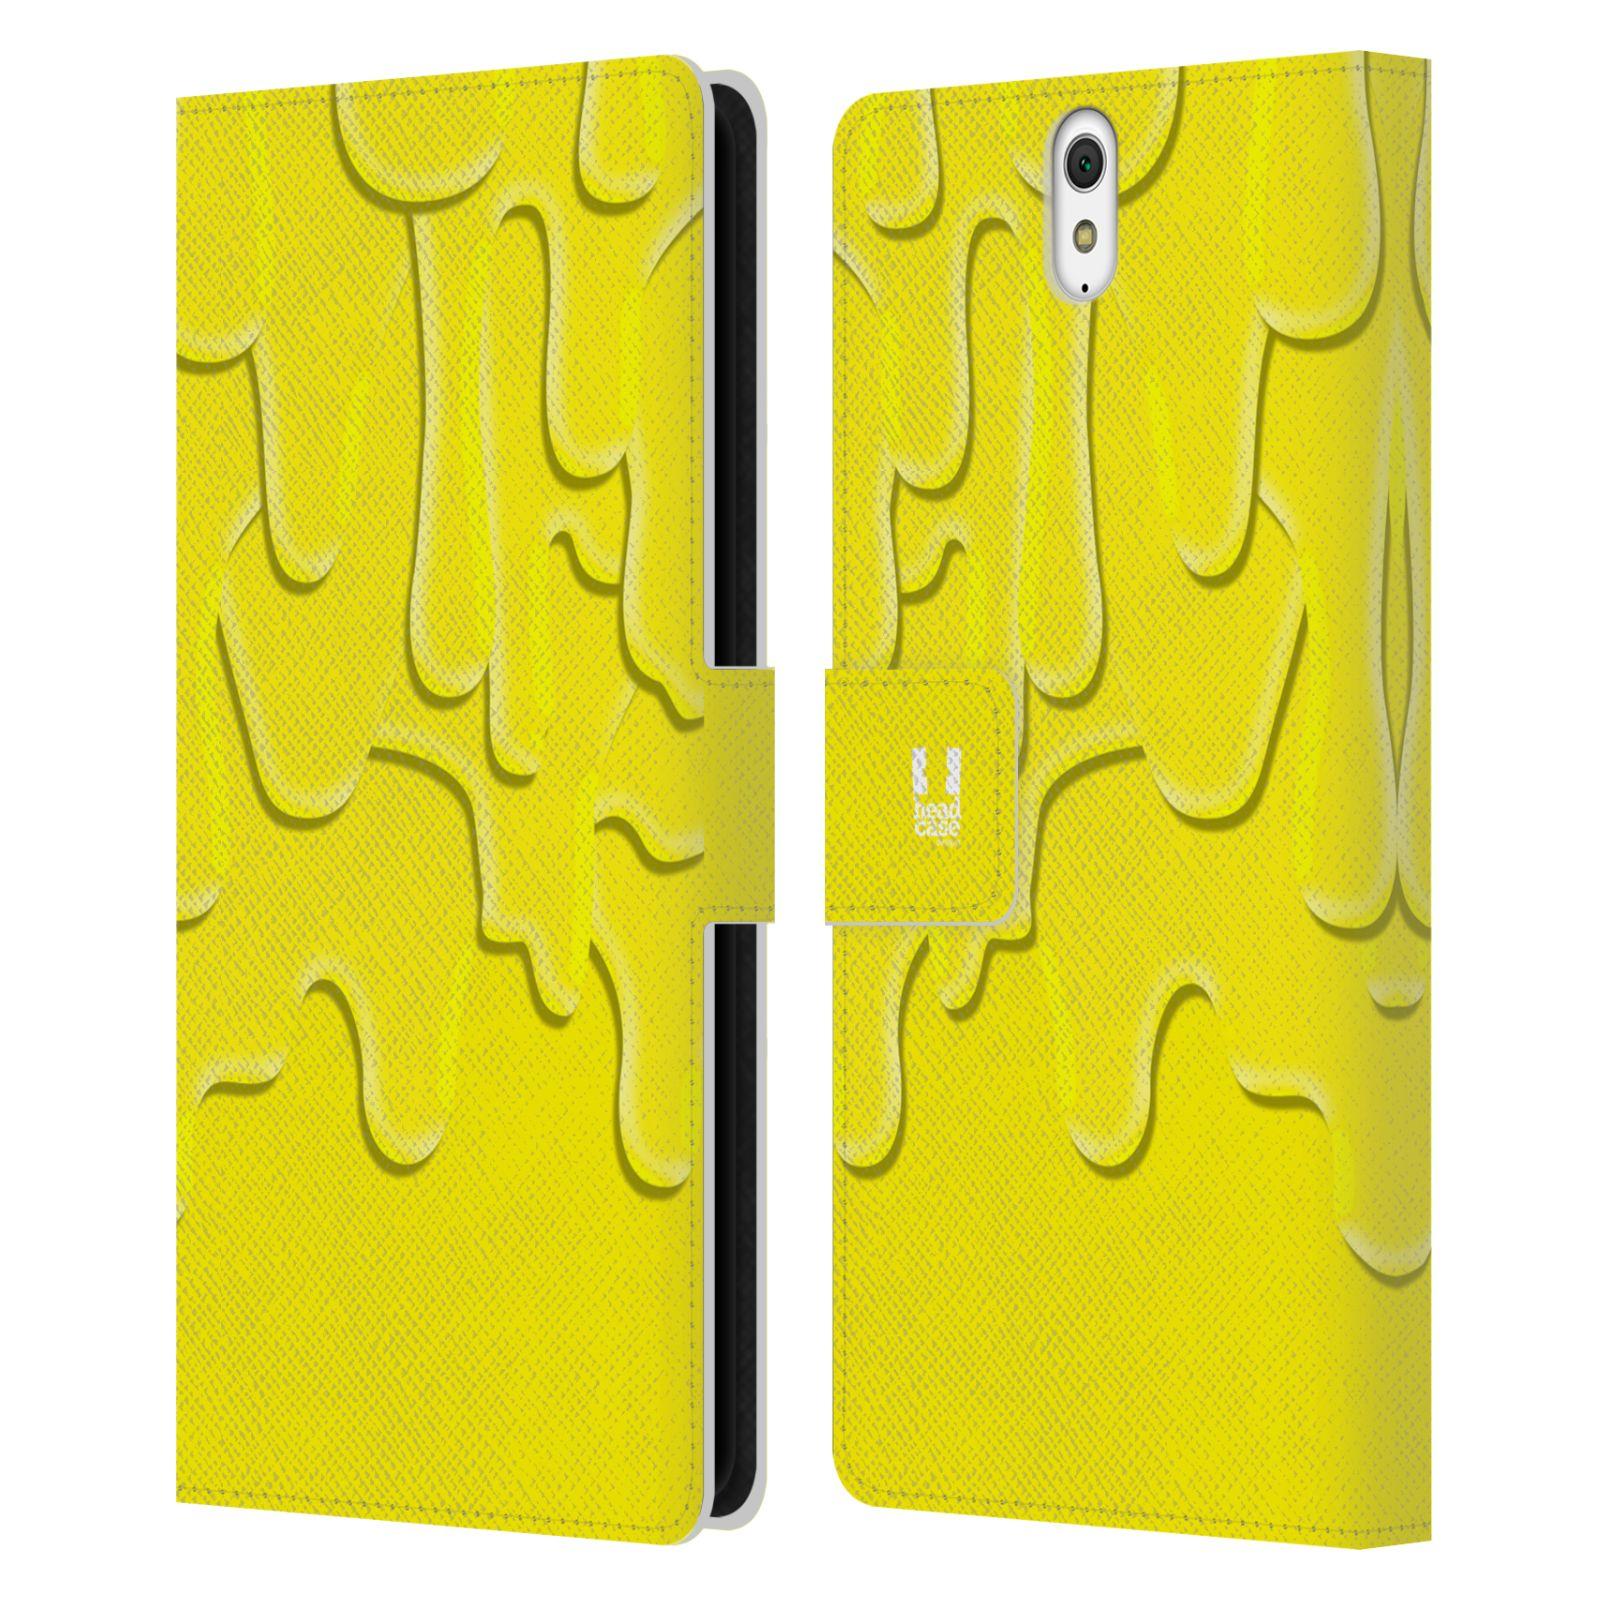 HEAD CASE Flipové pouzdro pro mobil SONY XPERIA C5 Ultra ZÁPLAVA BARVA žlutá